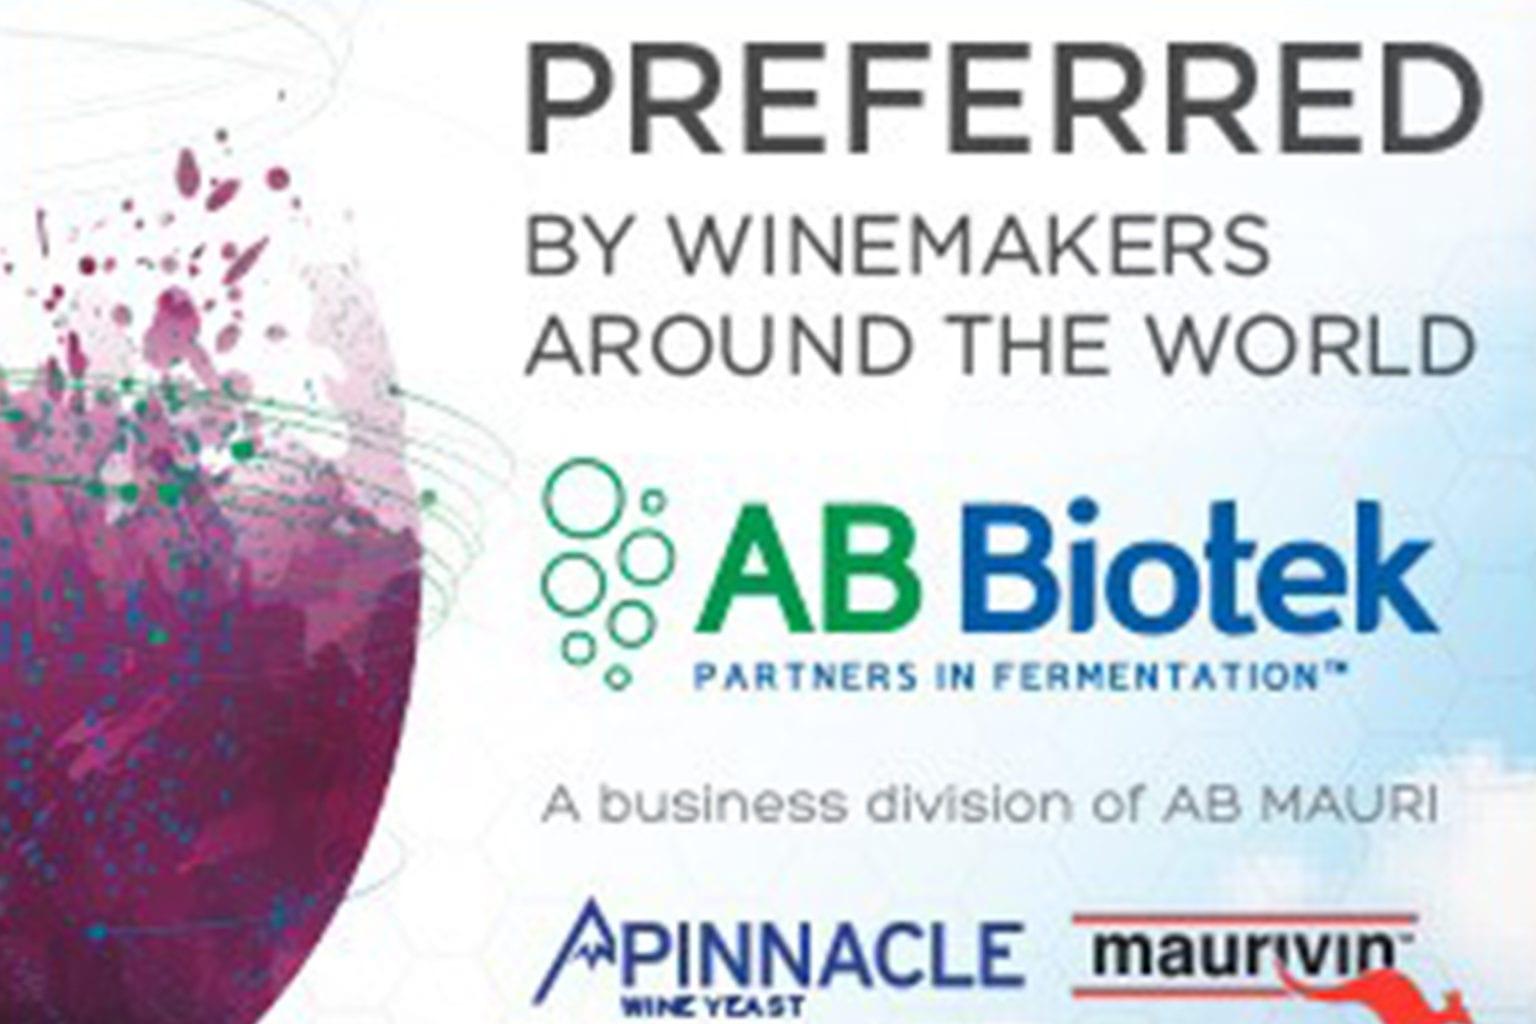 New AB Biotek Distributors